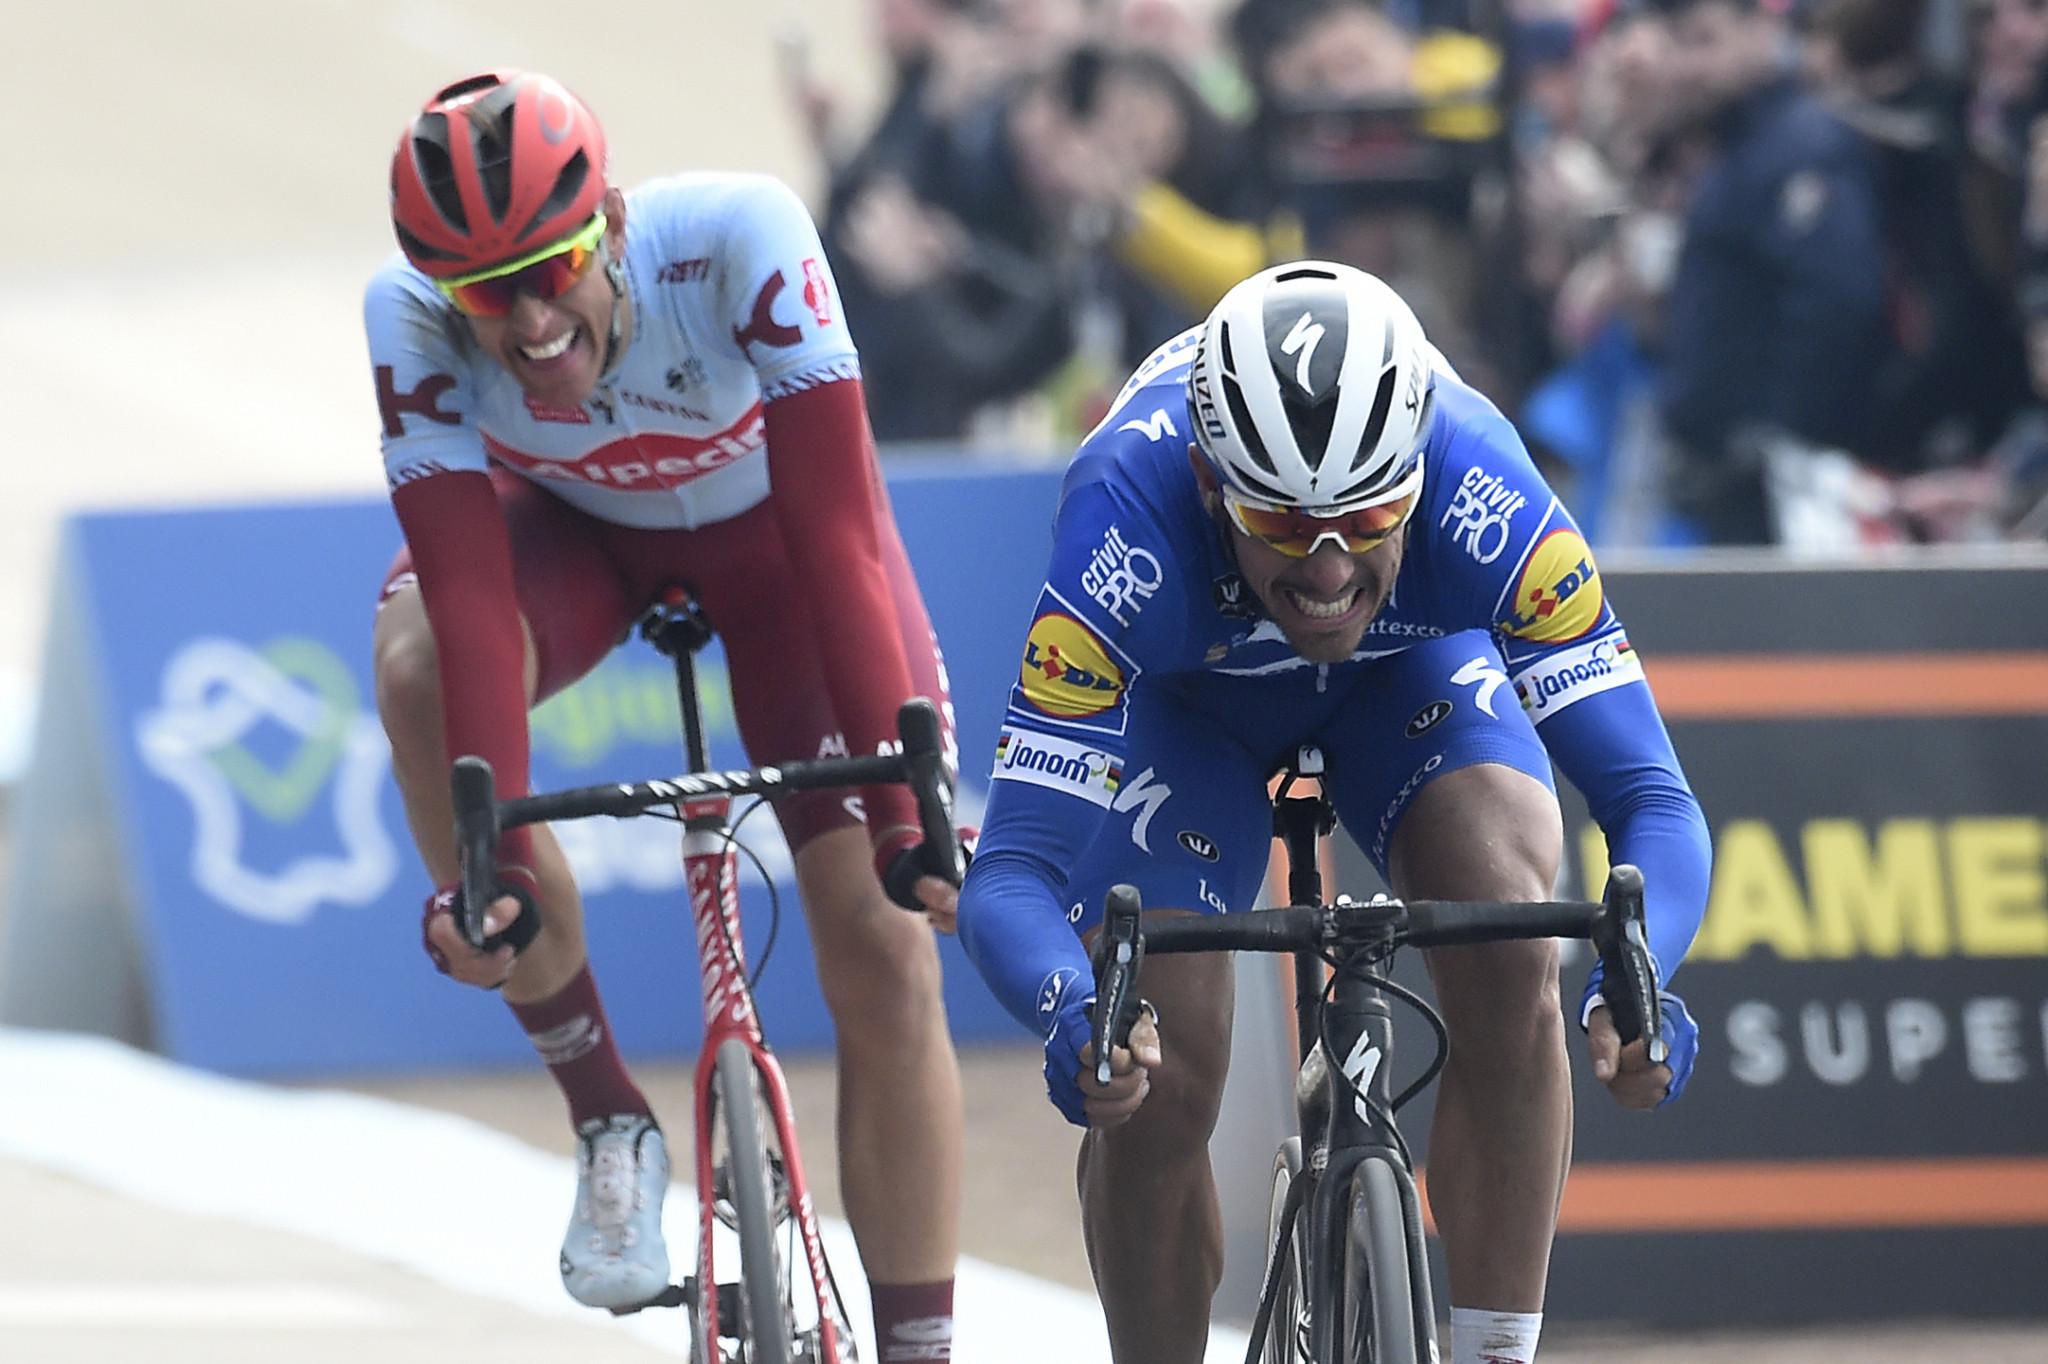 Gilbert out sprints Politt to win Paris-Roubaix for first time